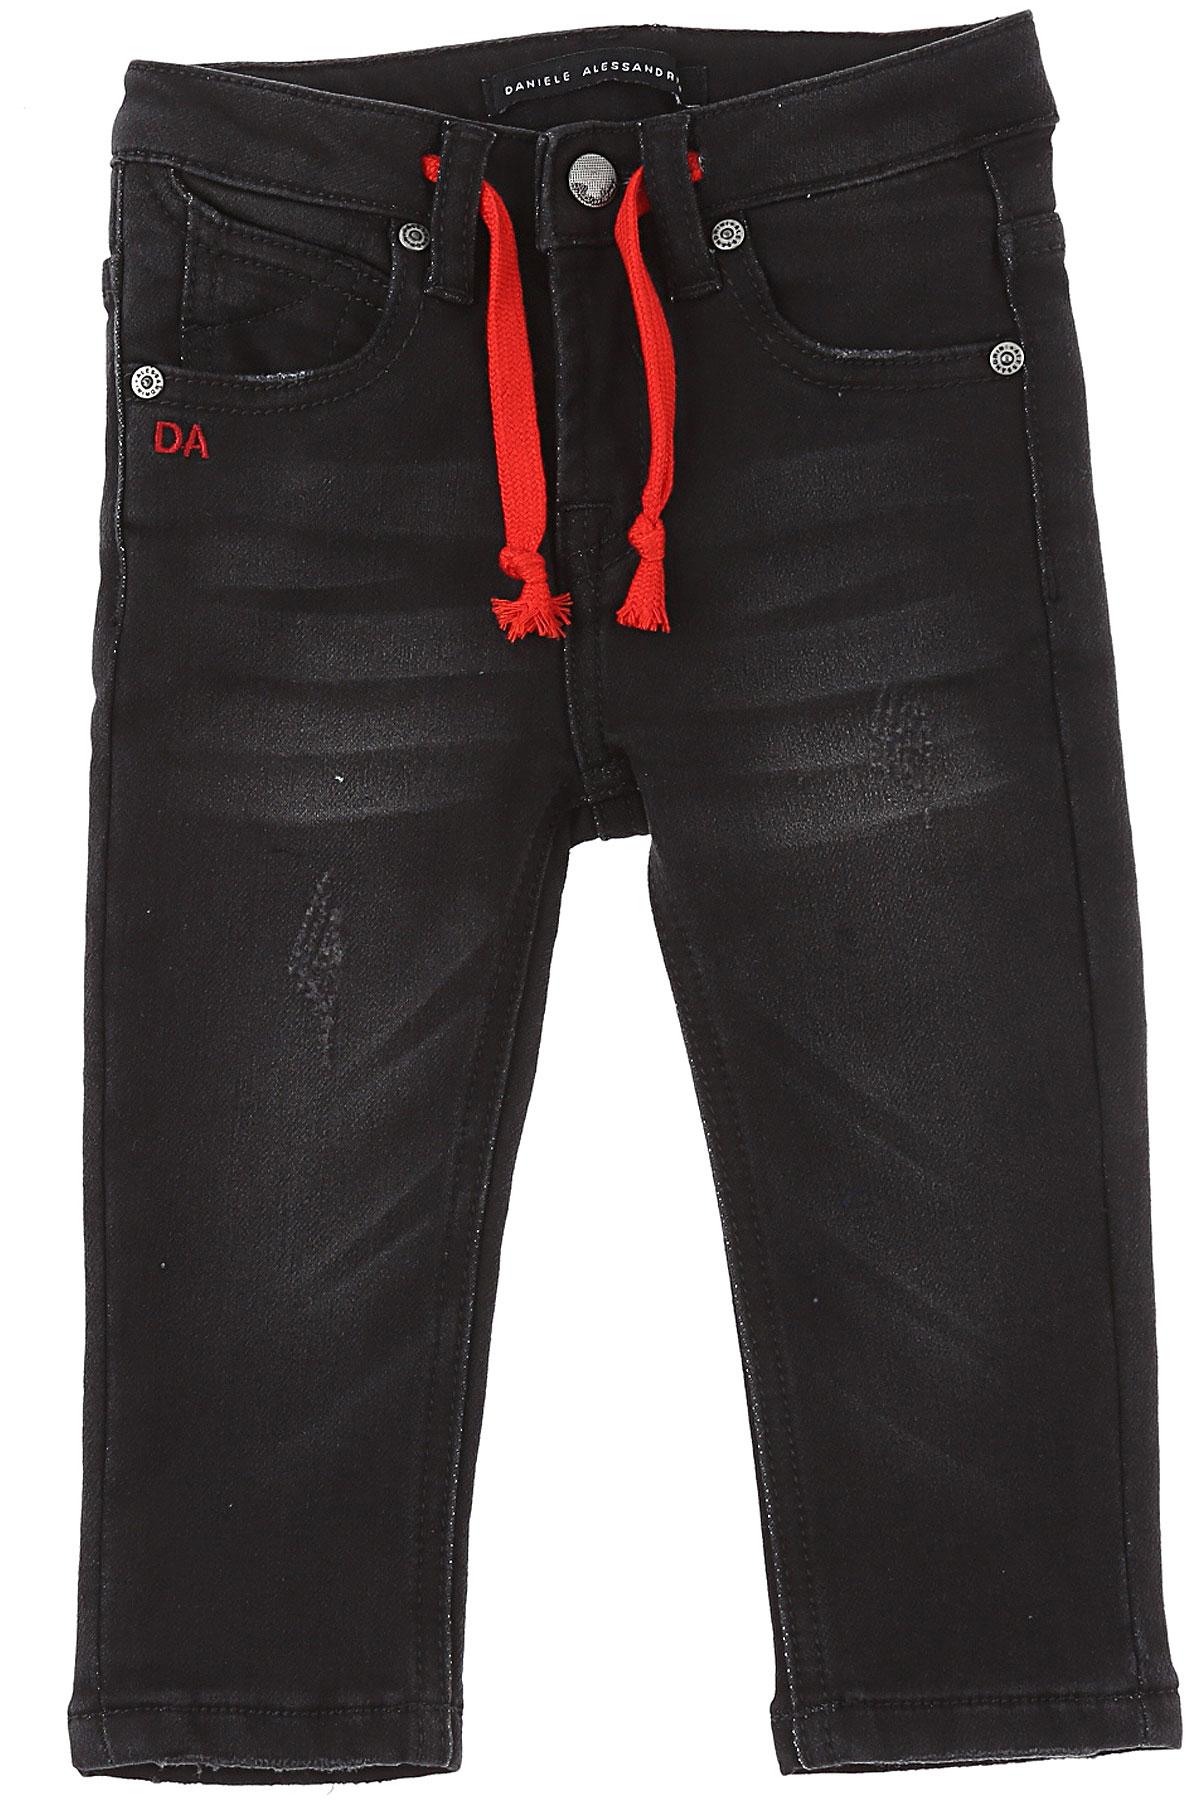 Daniele Alessandrini Baby Jeans for Boys On Sale, Black, Cotton, 2019, 18 M 6M 9 M